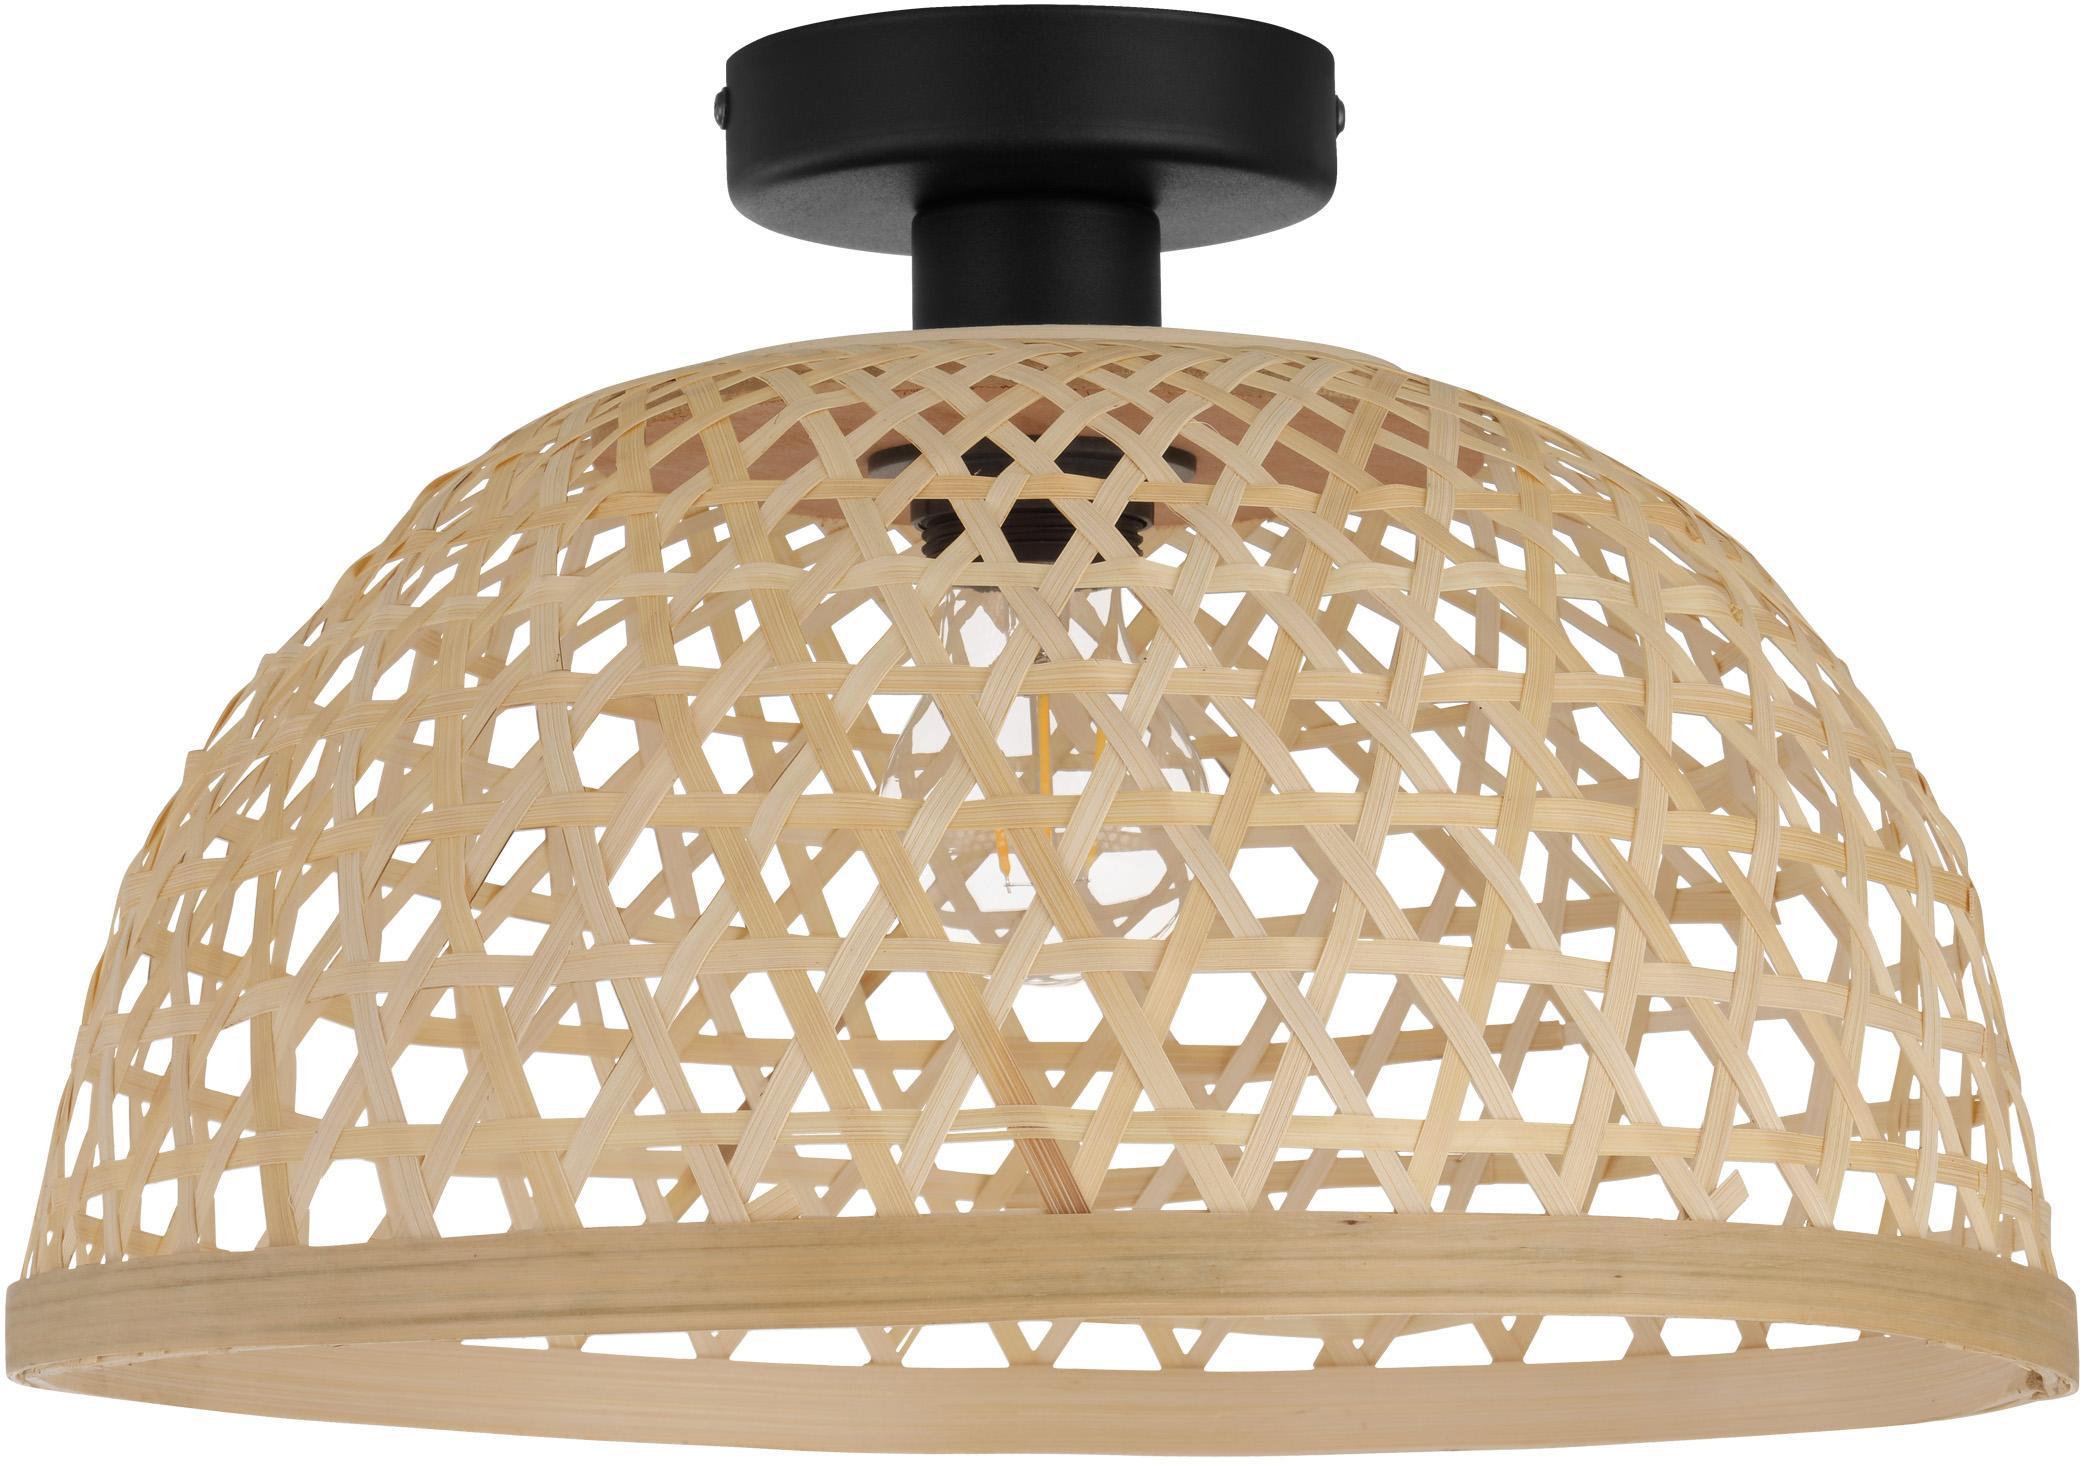 Plafoniera in bambù Claverdon, Paralume: legno di bambù, Baldacchino: metallo verniciato, Marrone chiaro, Ø 37 x Alt. 25 cm